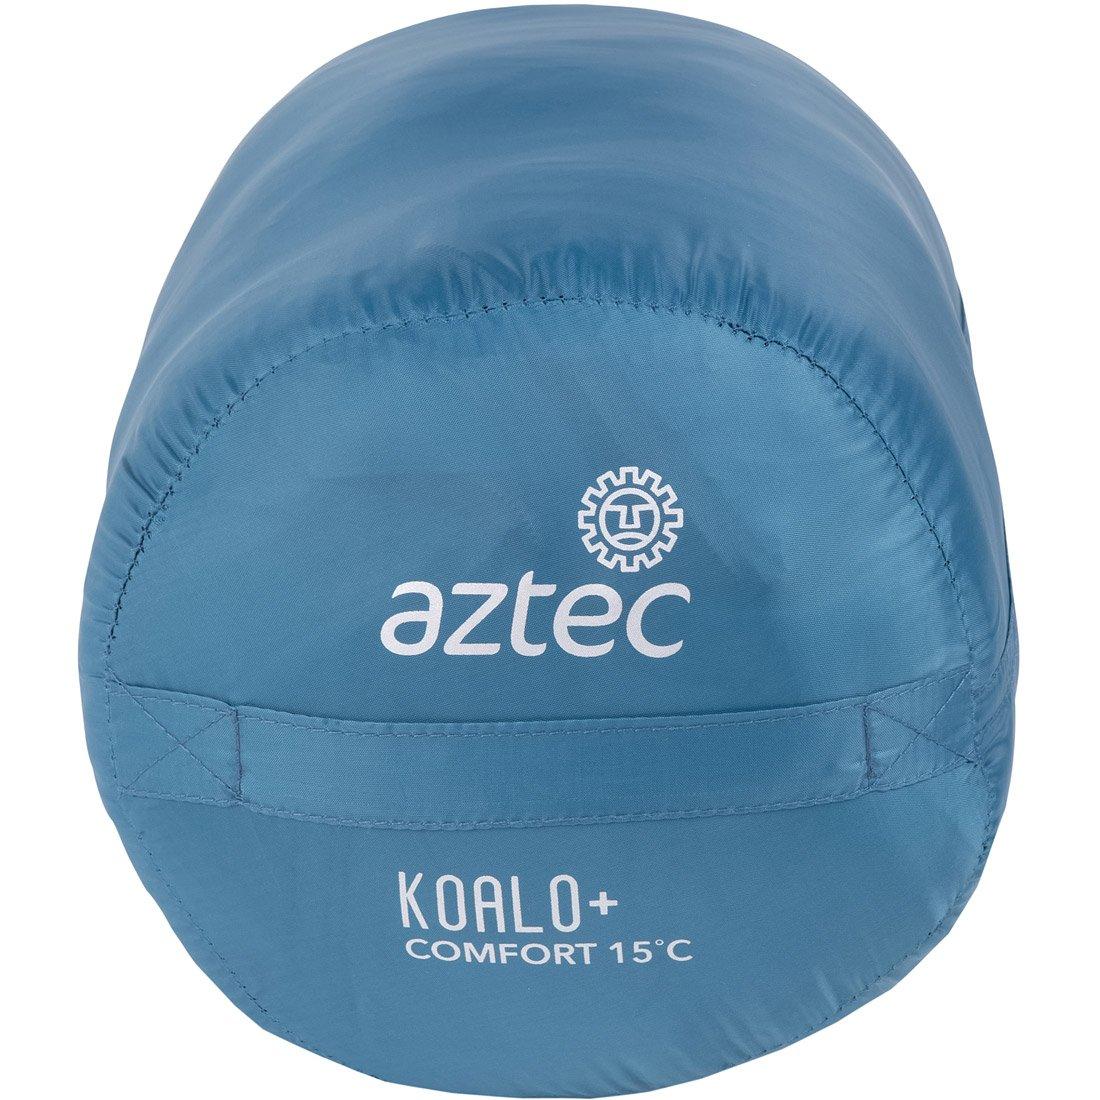 שק שינה - Koalo Plus - Aztec